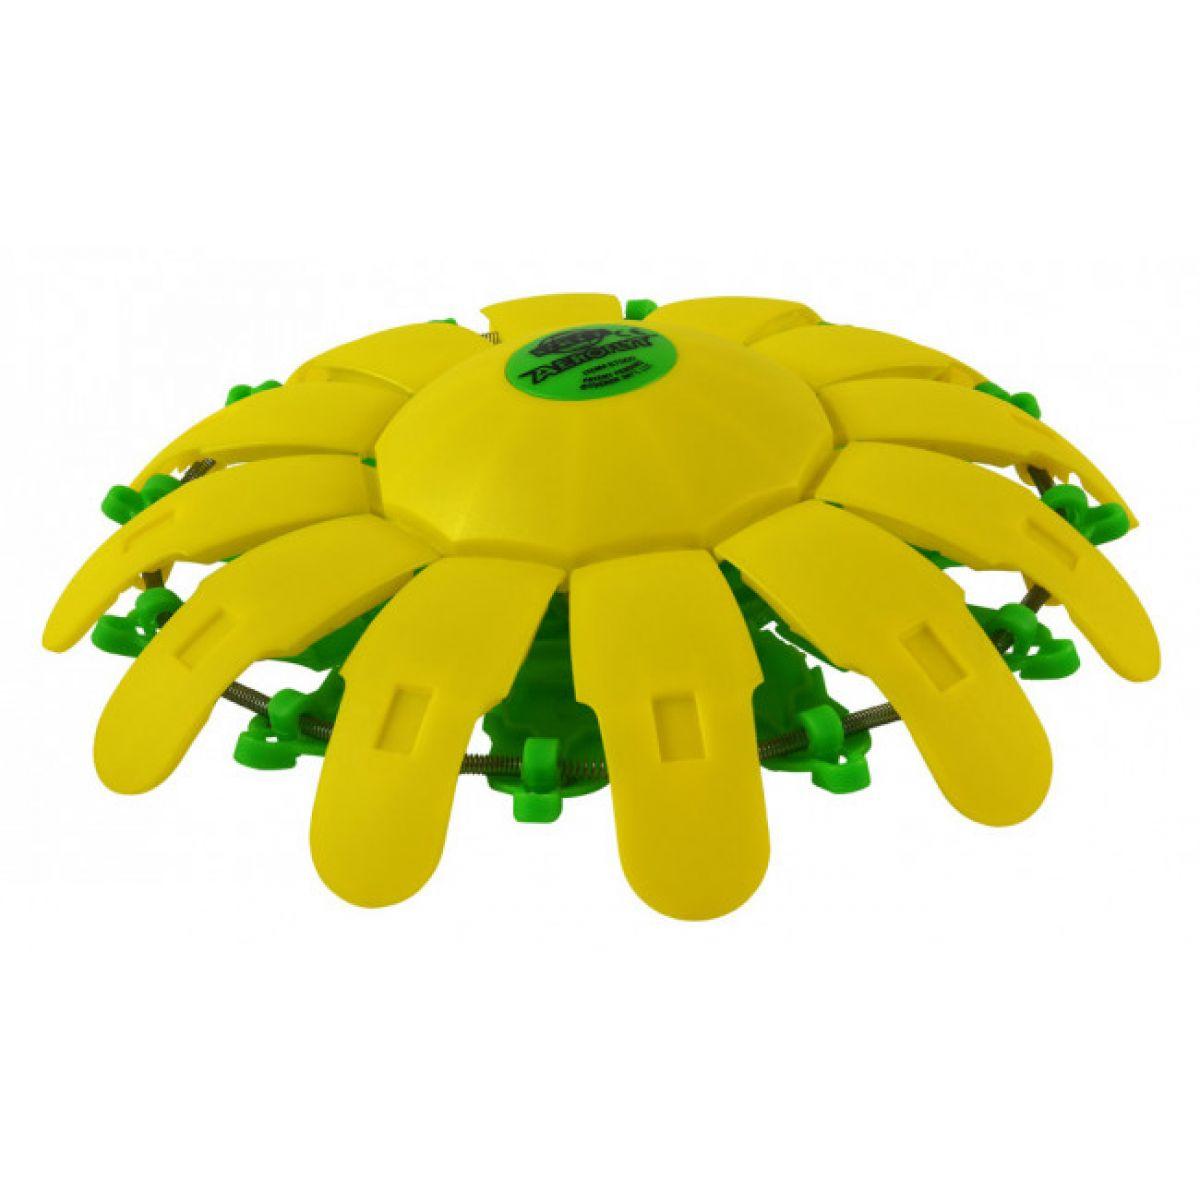 Phlat Ball UFO Žluto-zelená #3